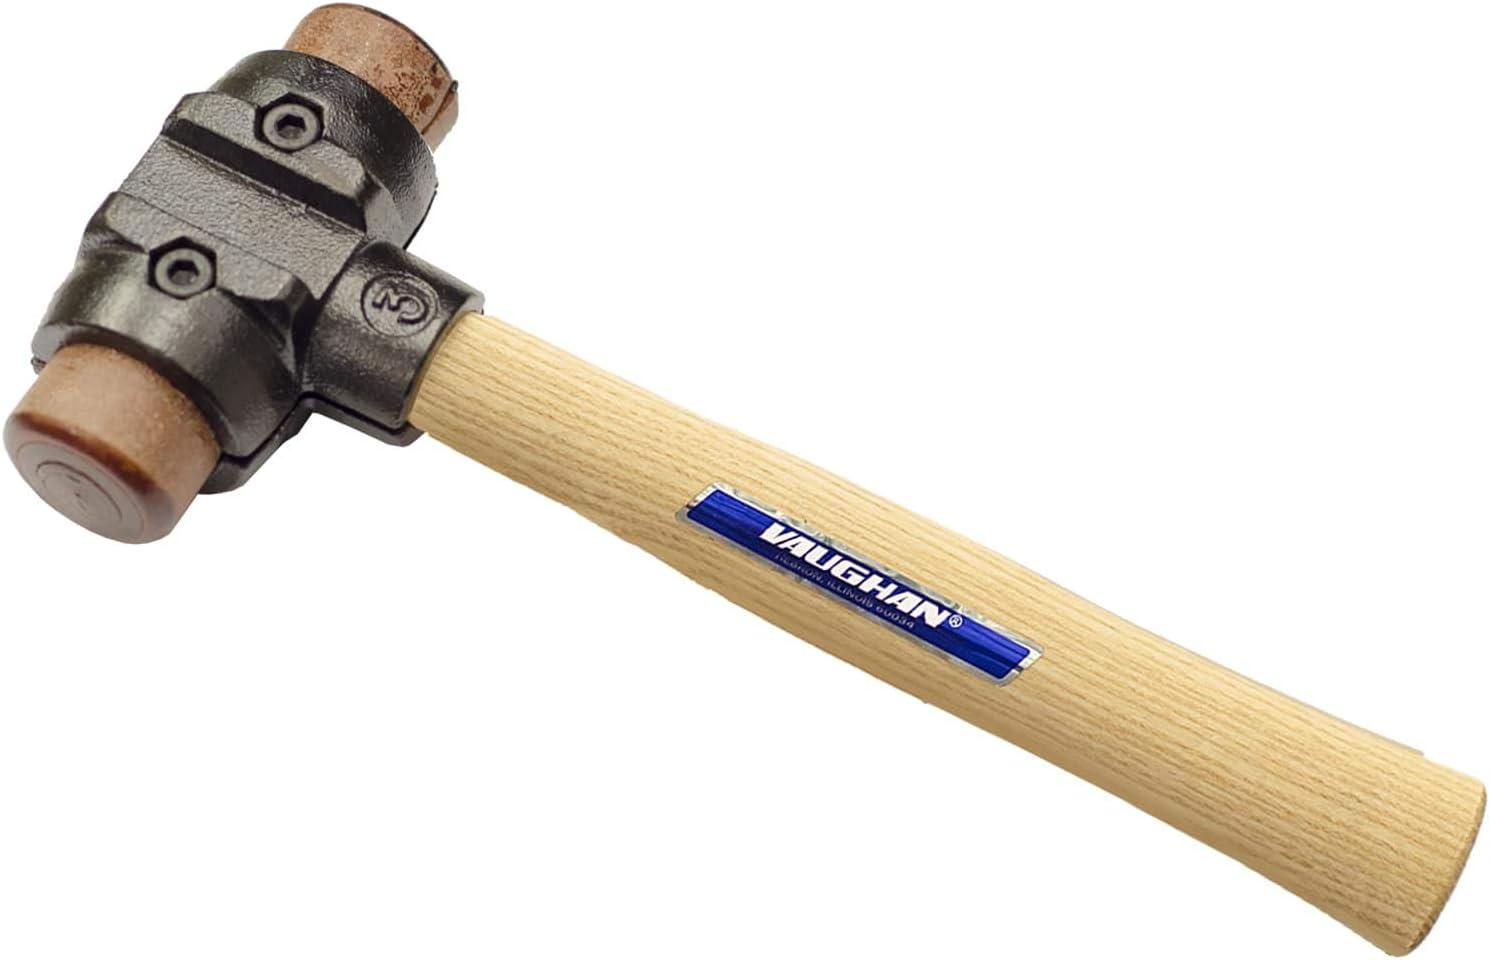 Bon Vaughan discount 587-14 Split-Face Hammer 1.75-inch Rawhide Face Tucson Mall Dia